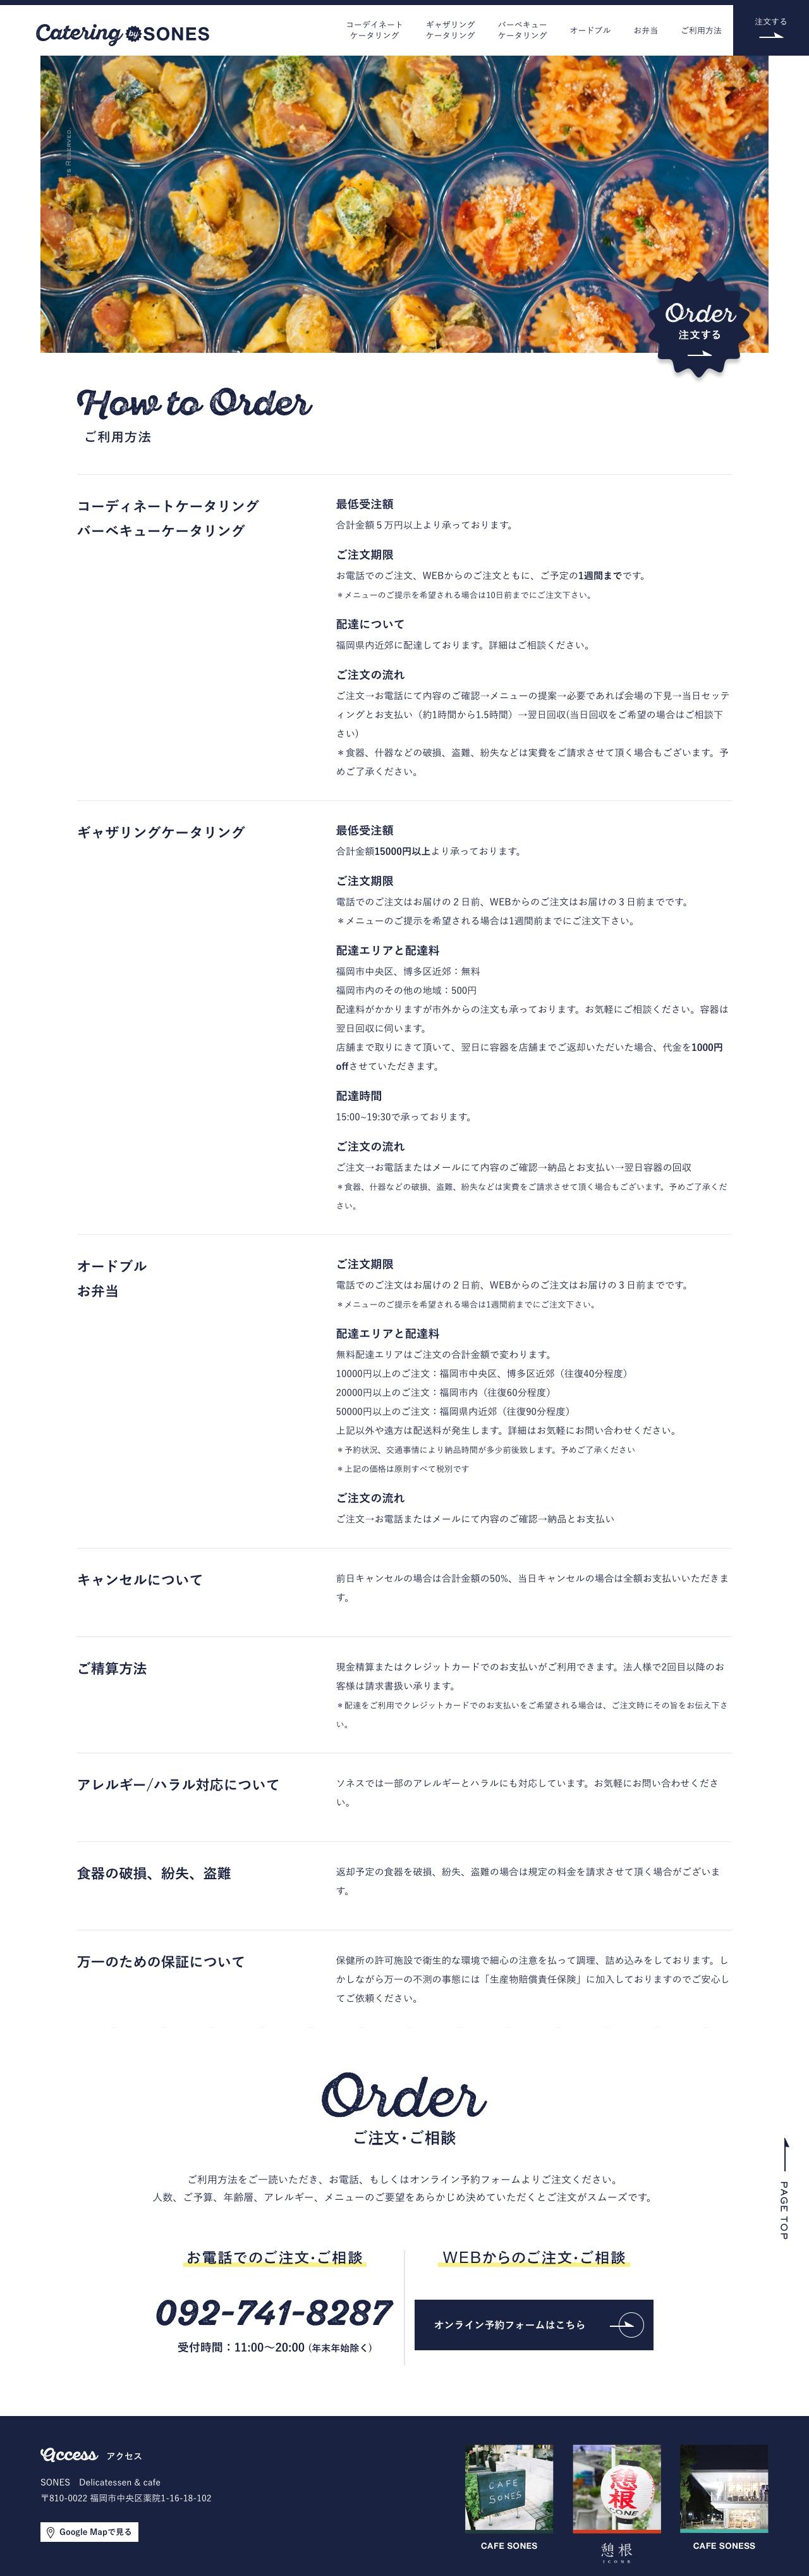 screencapture-sones-cc-catering-howto-2018-05-02-10_50_22